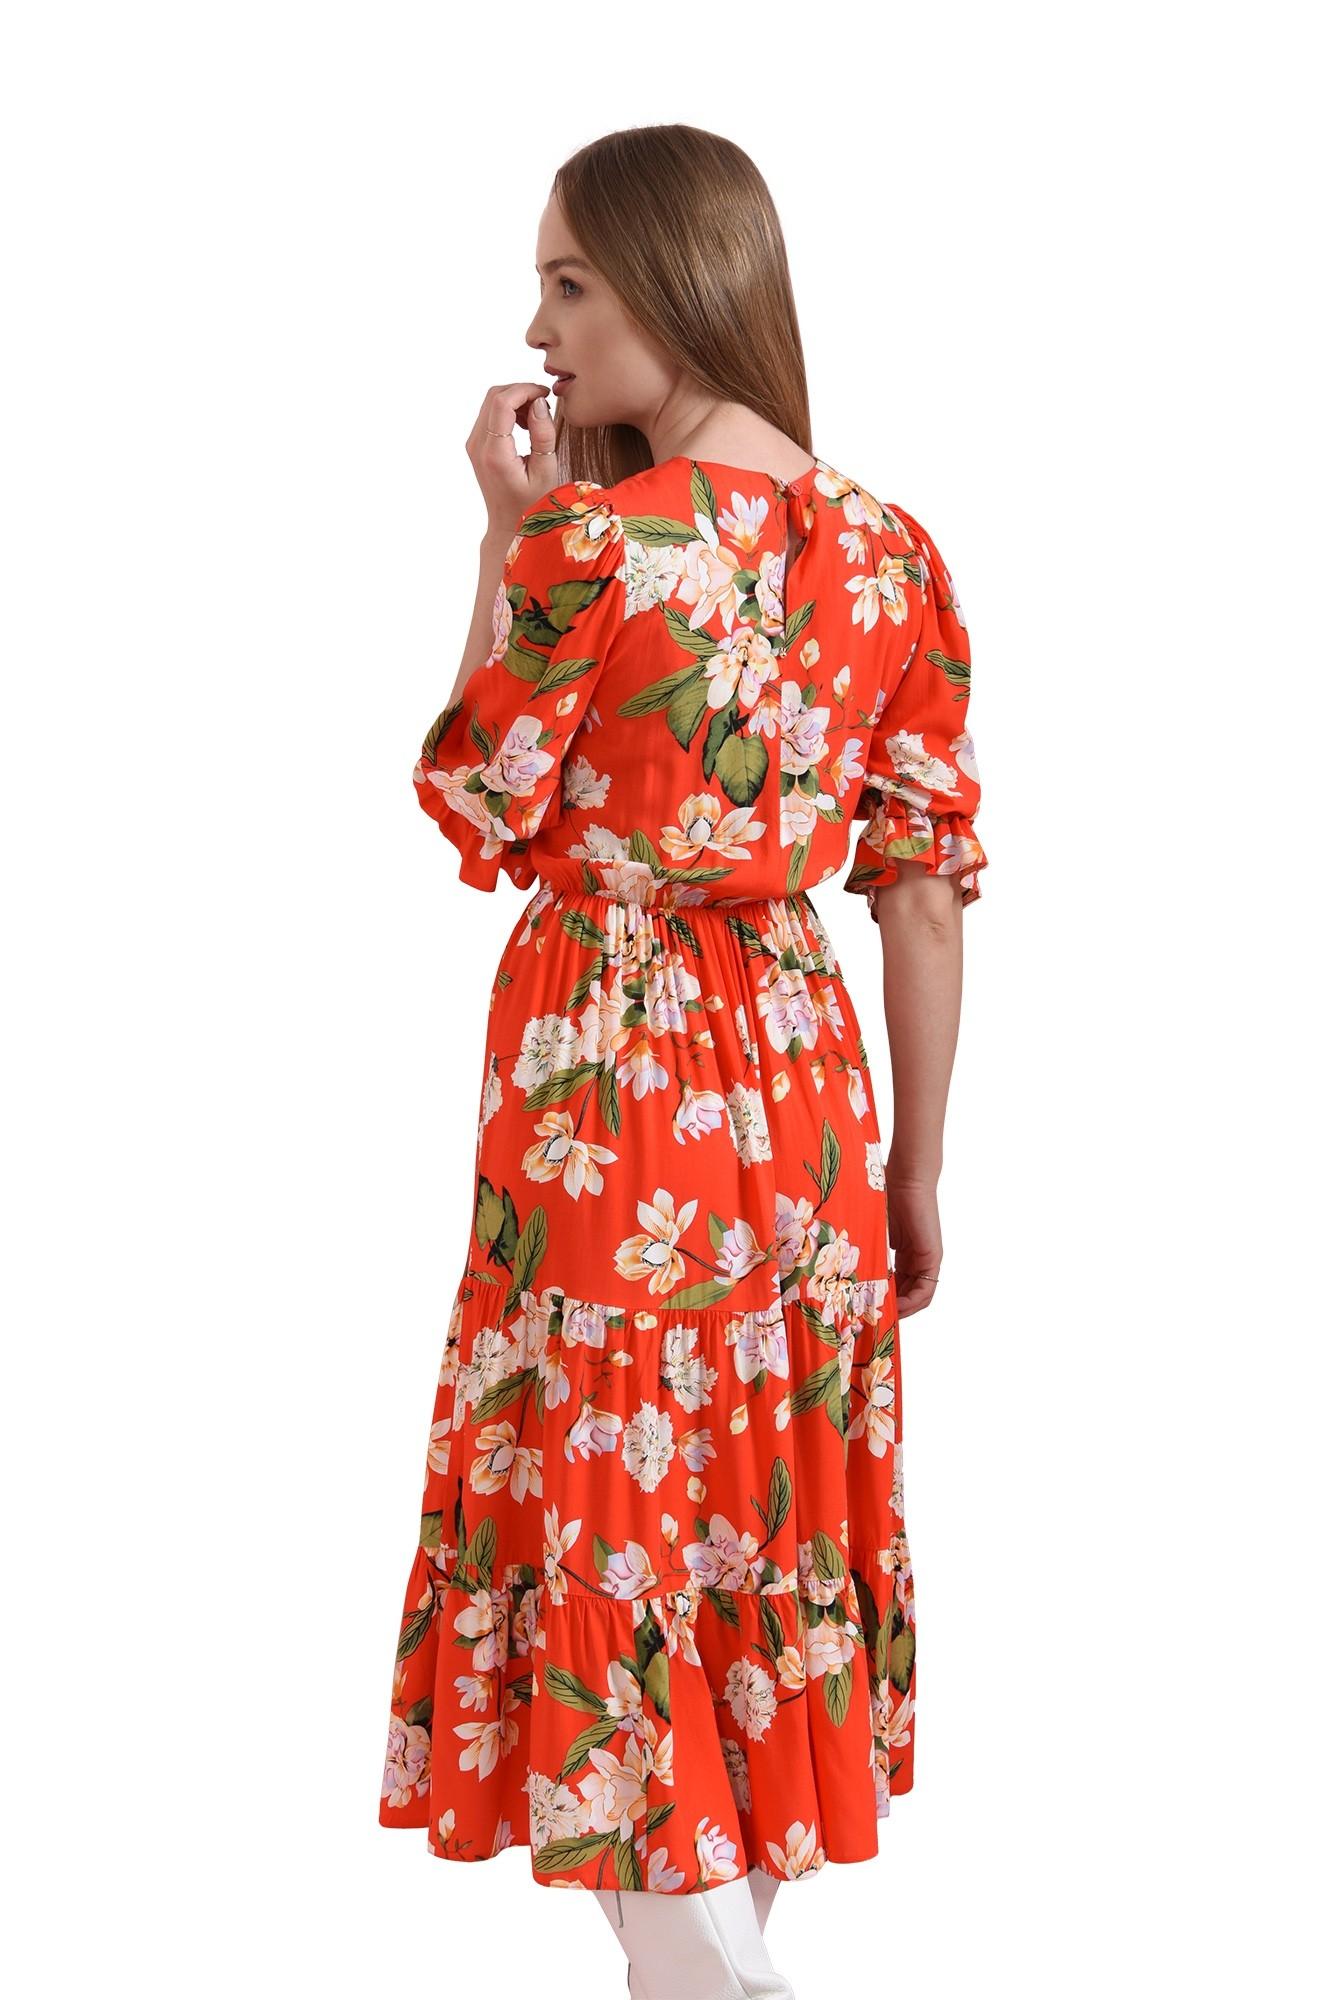 3 - rochie cu elastic la talie, Poema